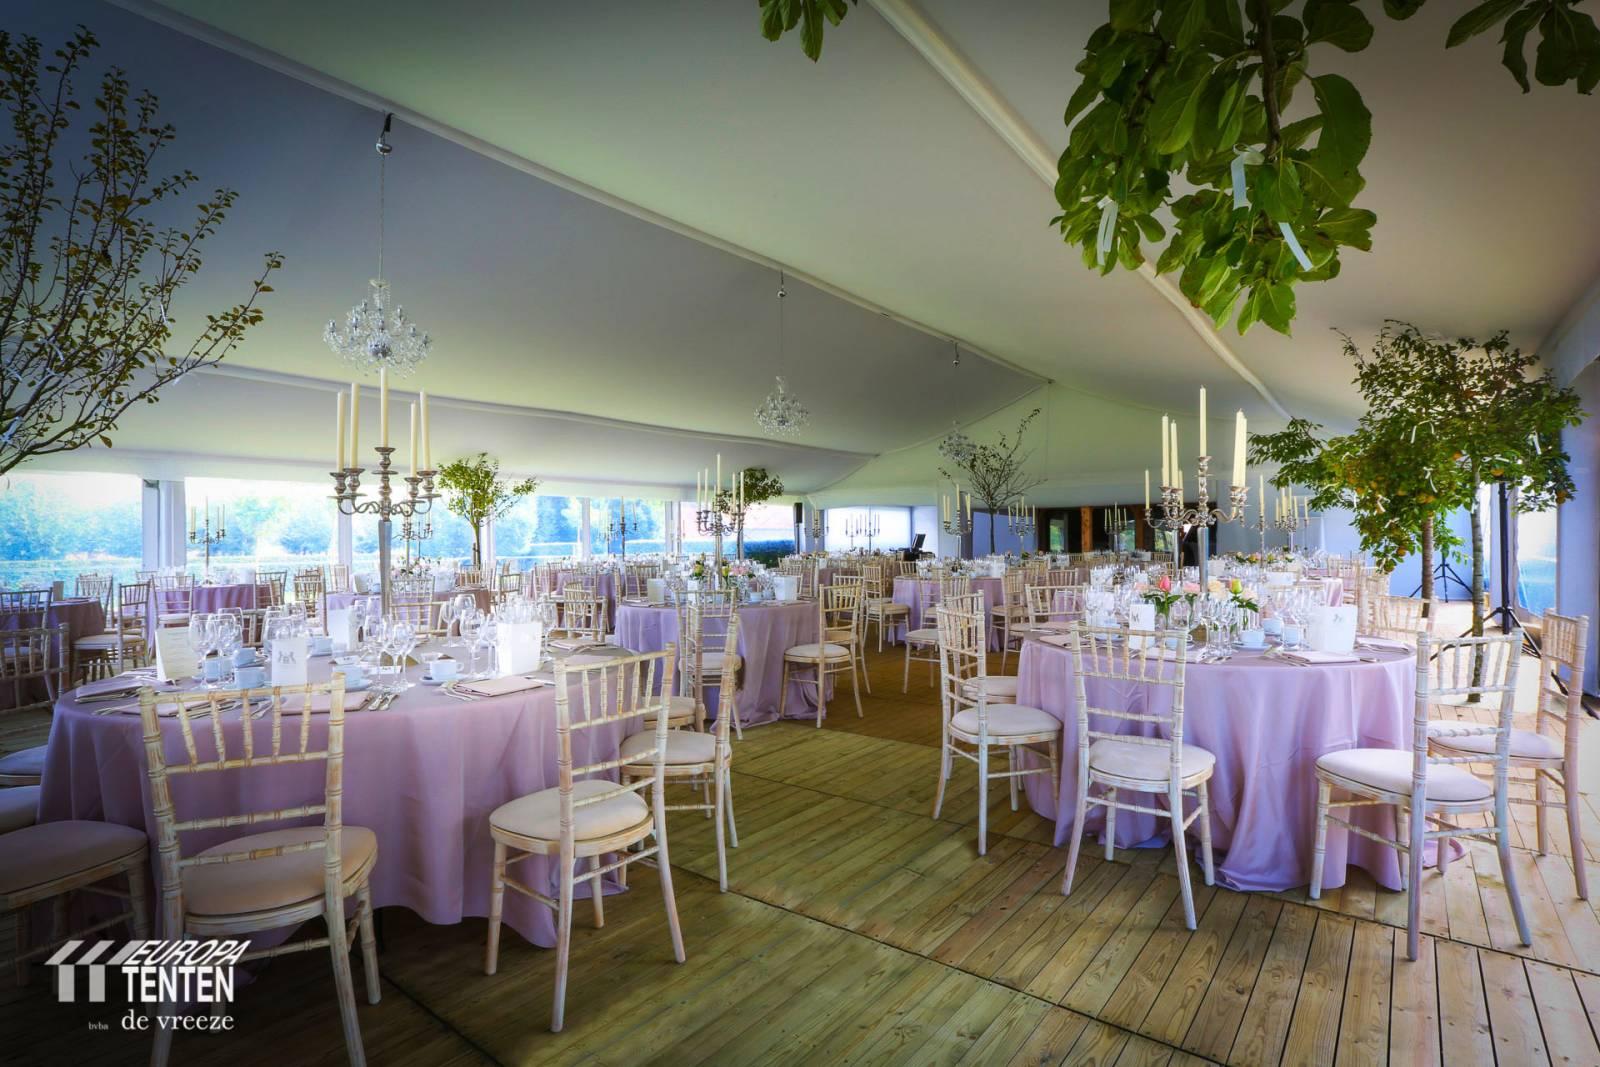 Europatenten 2 - House of Weddings-09